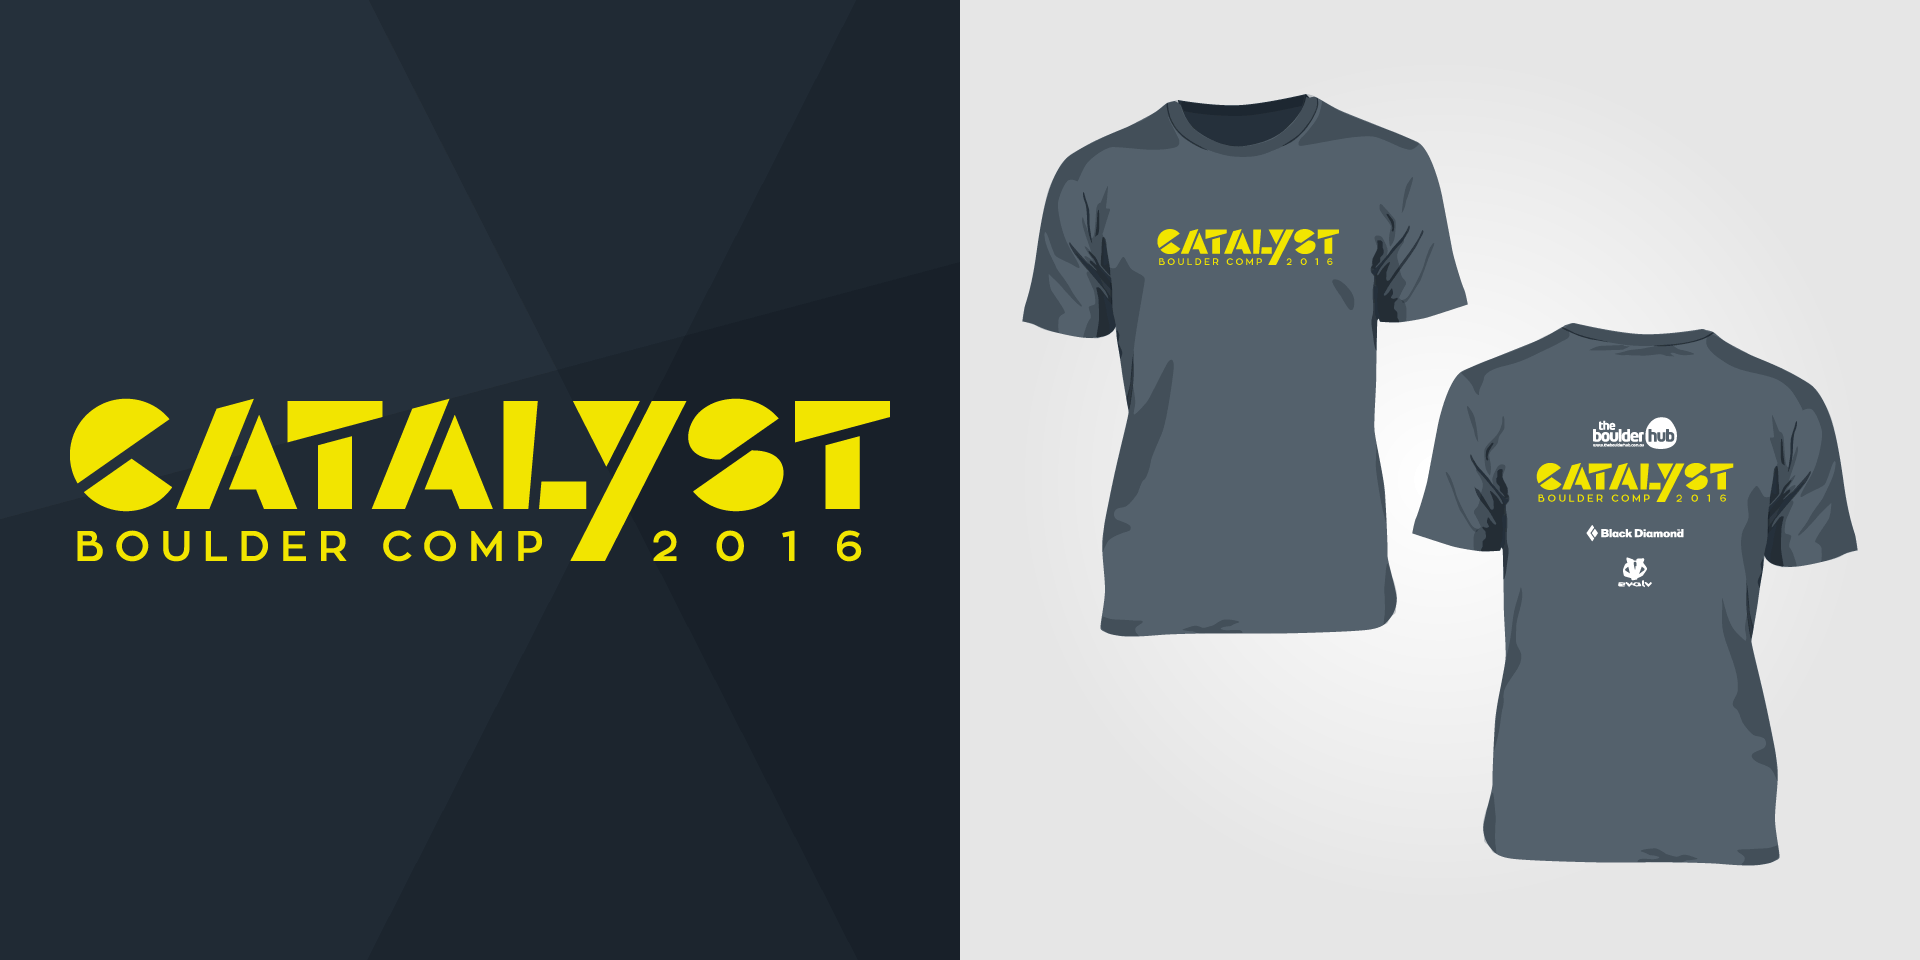 logo-tshirt-catalyst-bouldering-climbing-competition-hub